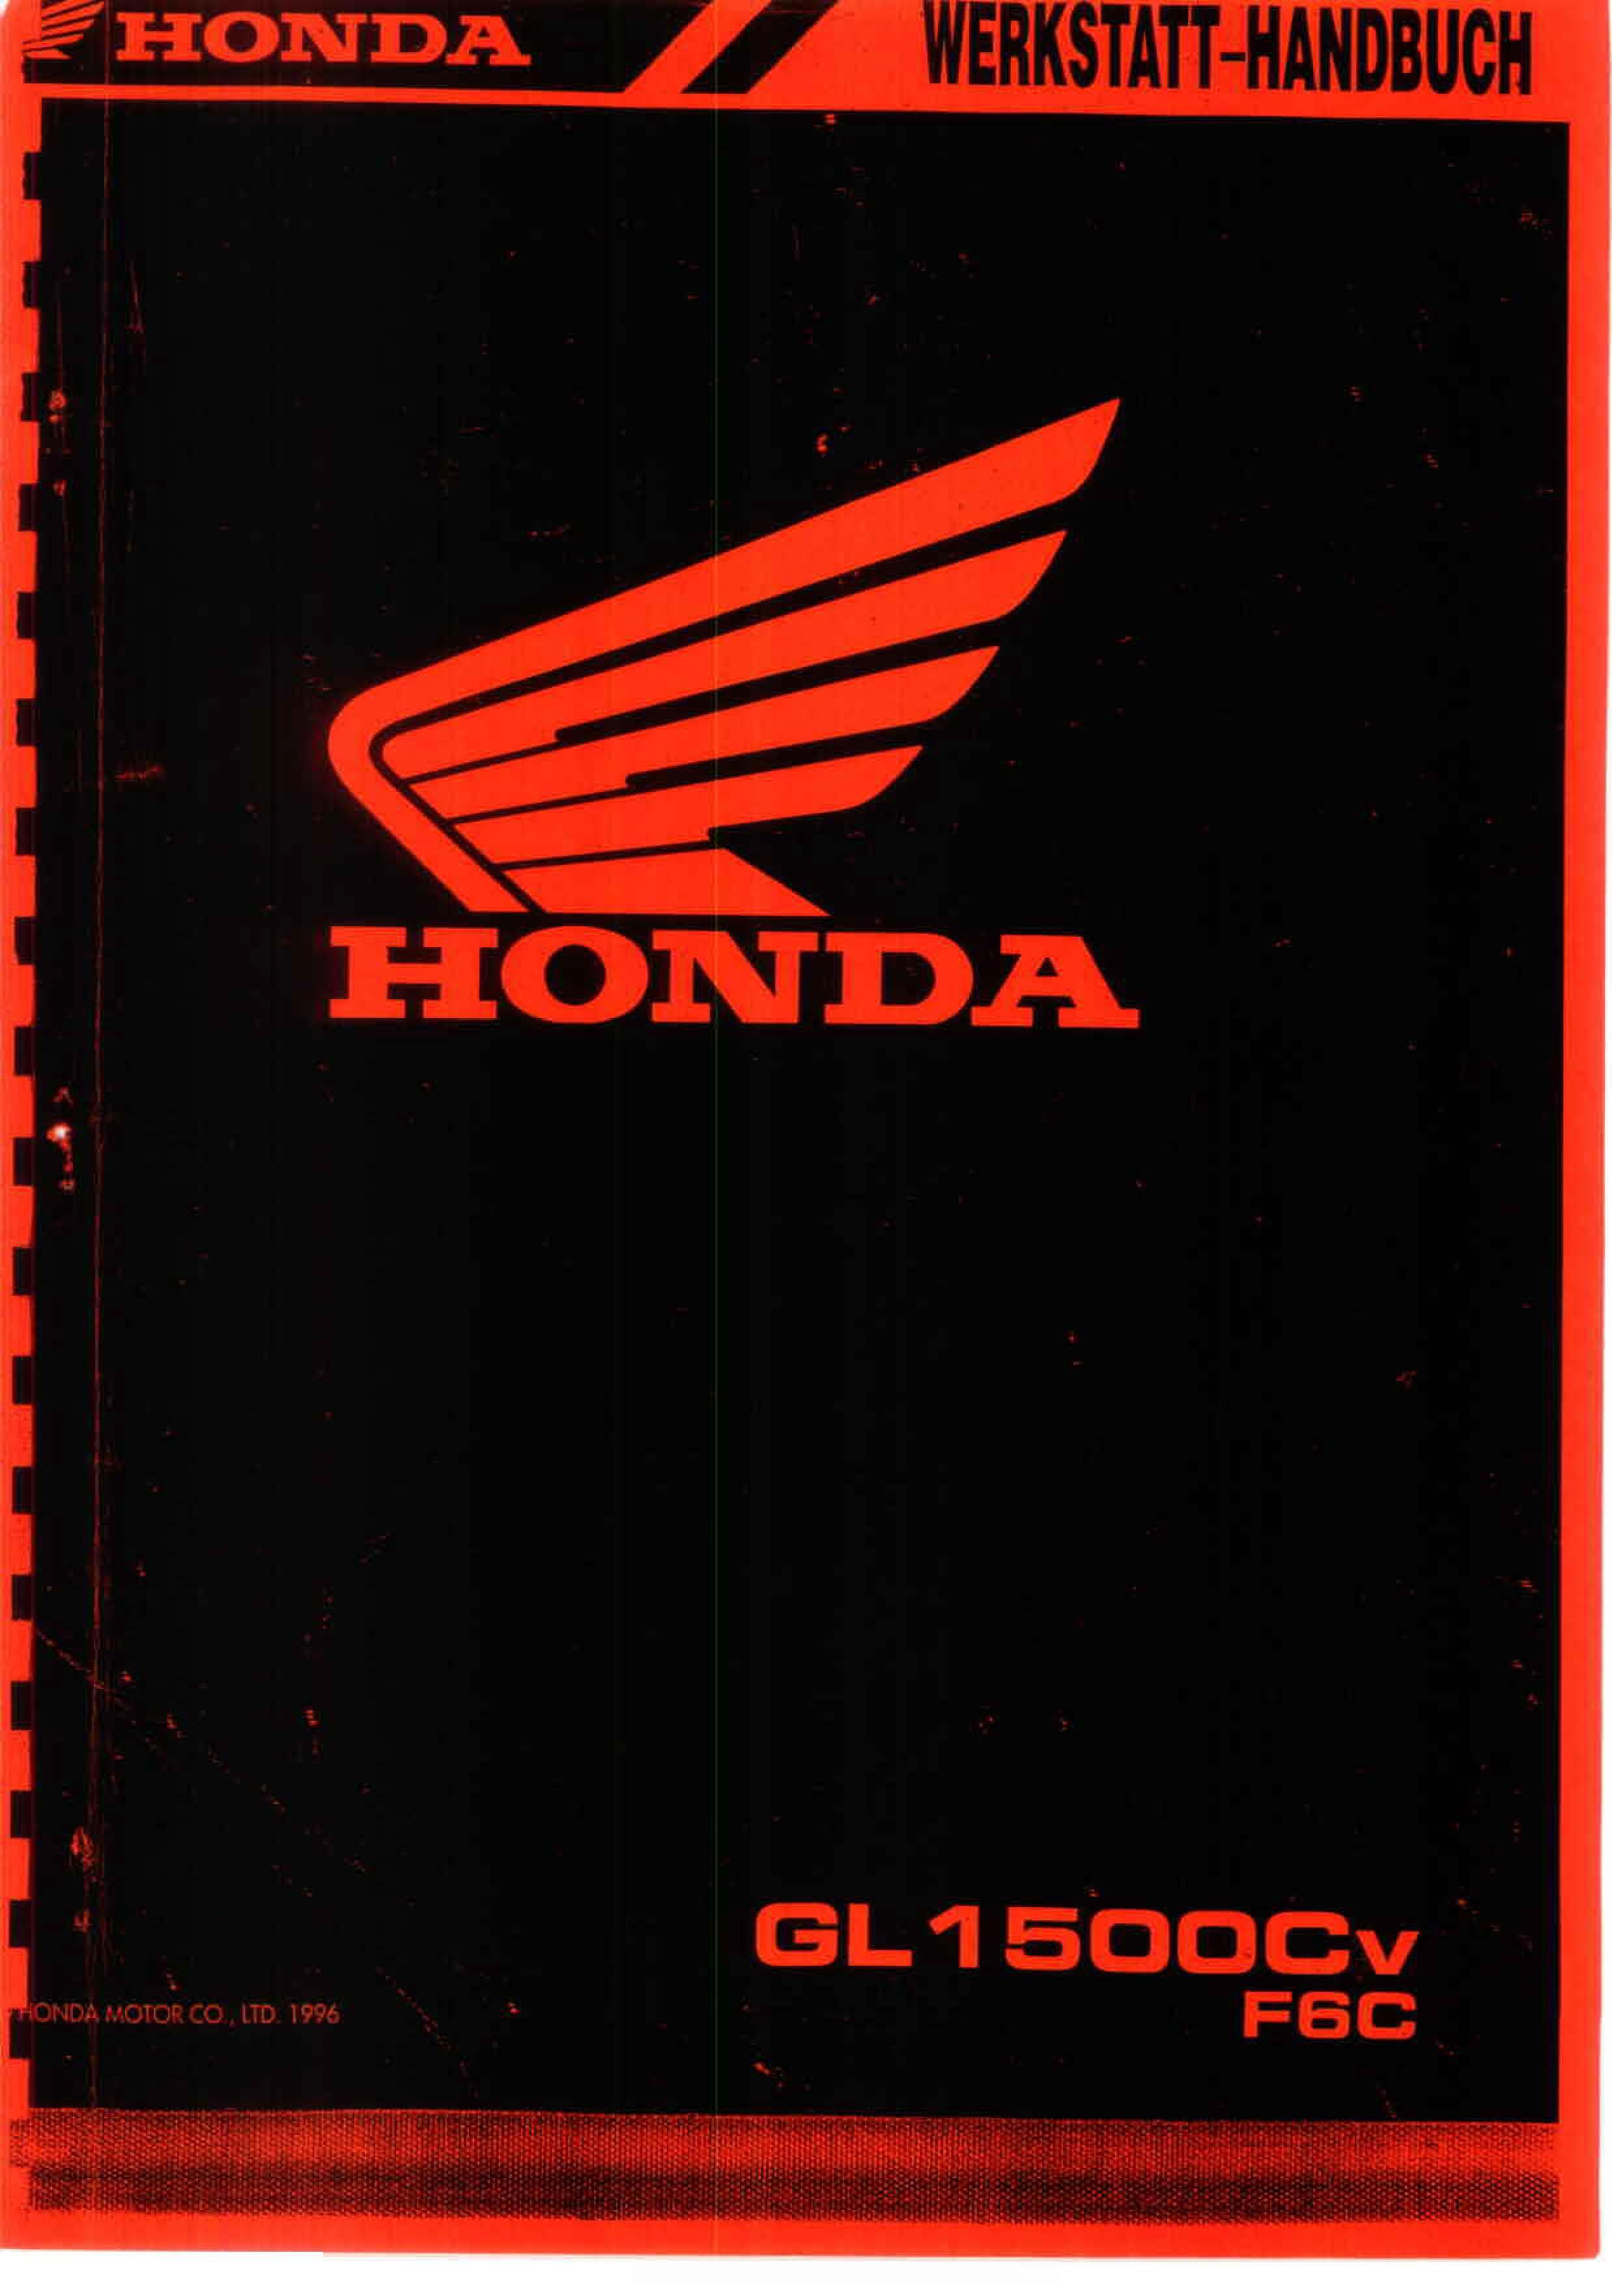 Workshop manual for Honda GL1500CV F6C (1996) (German)